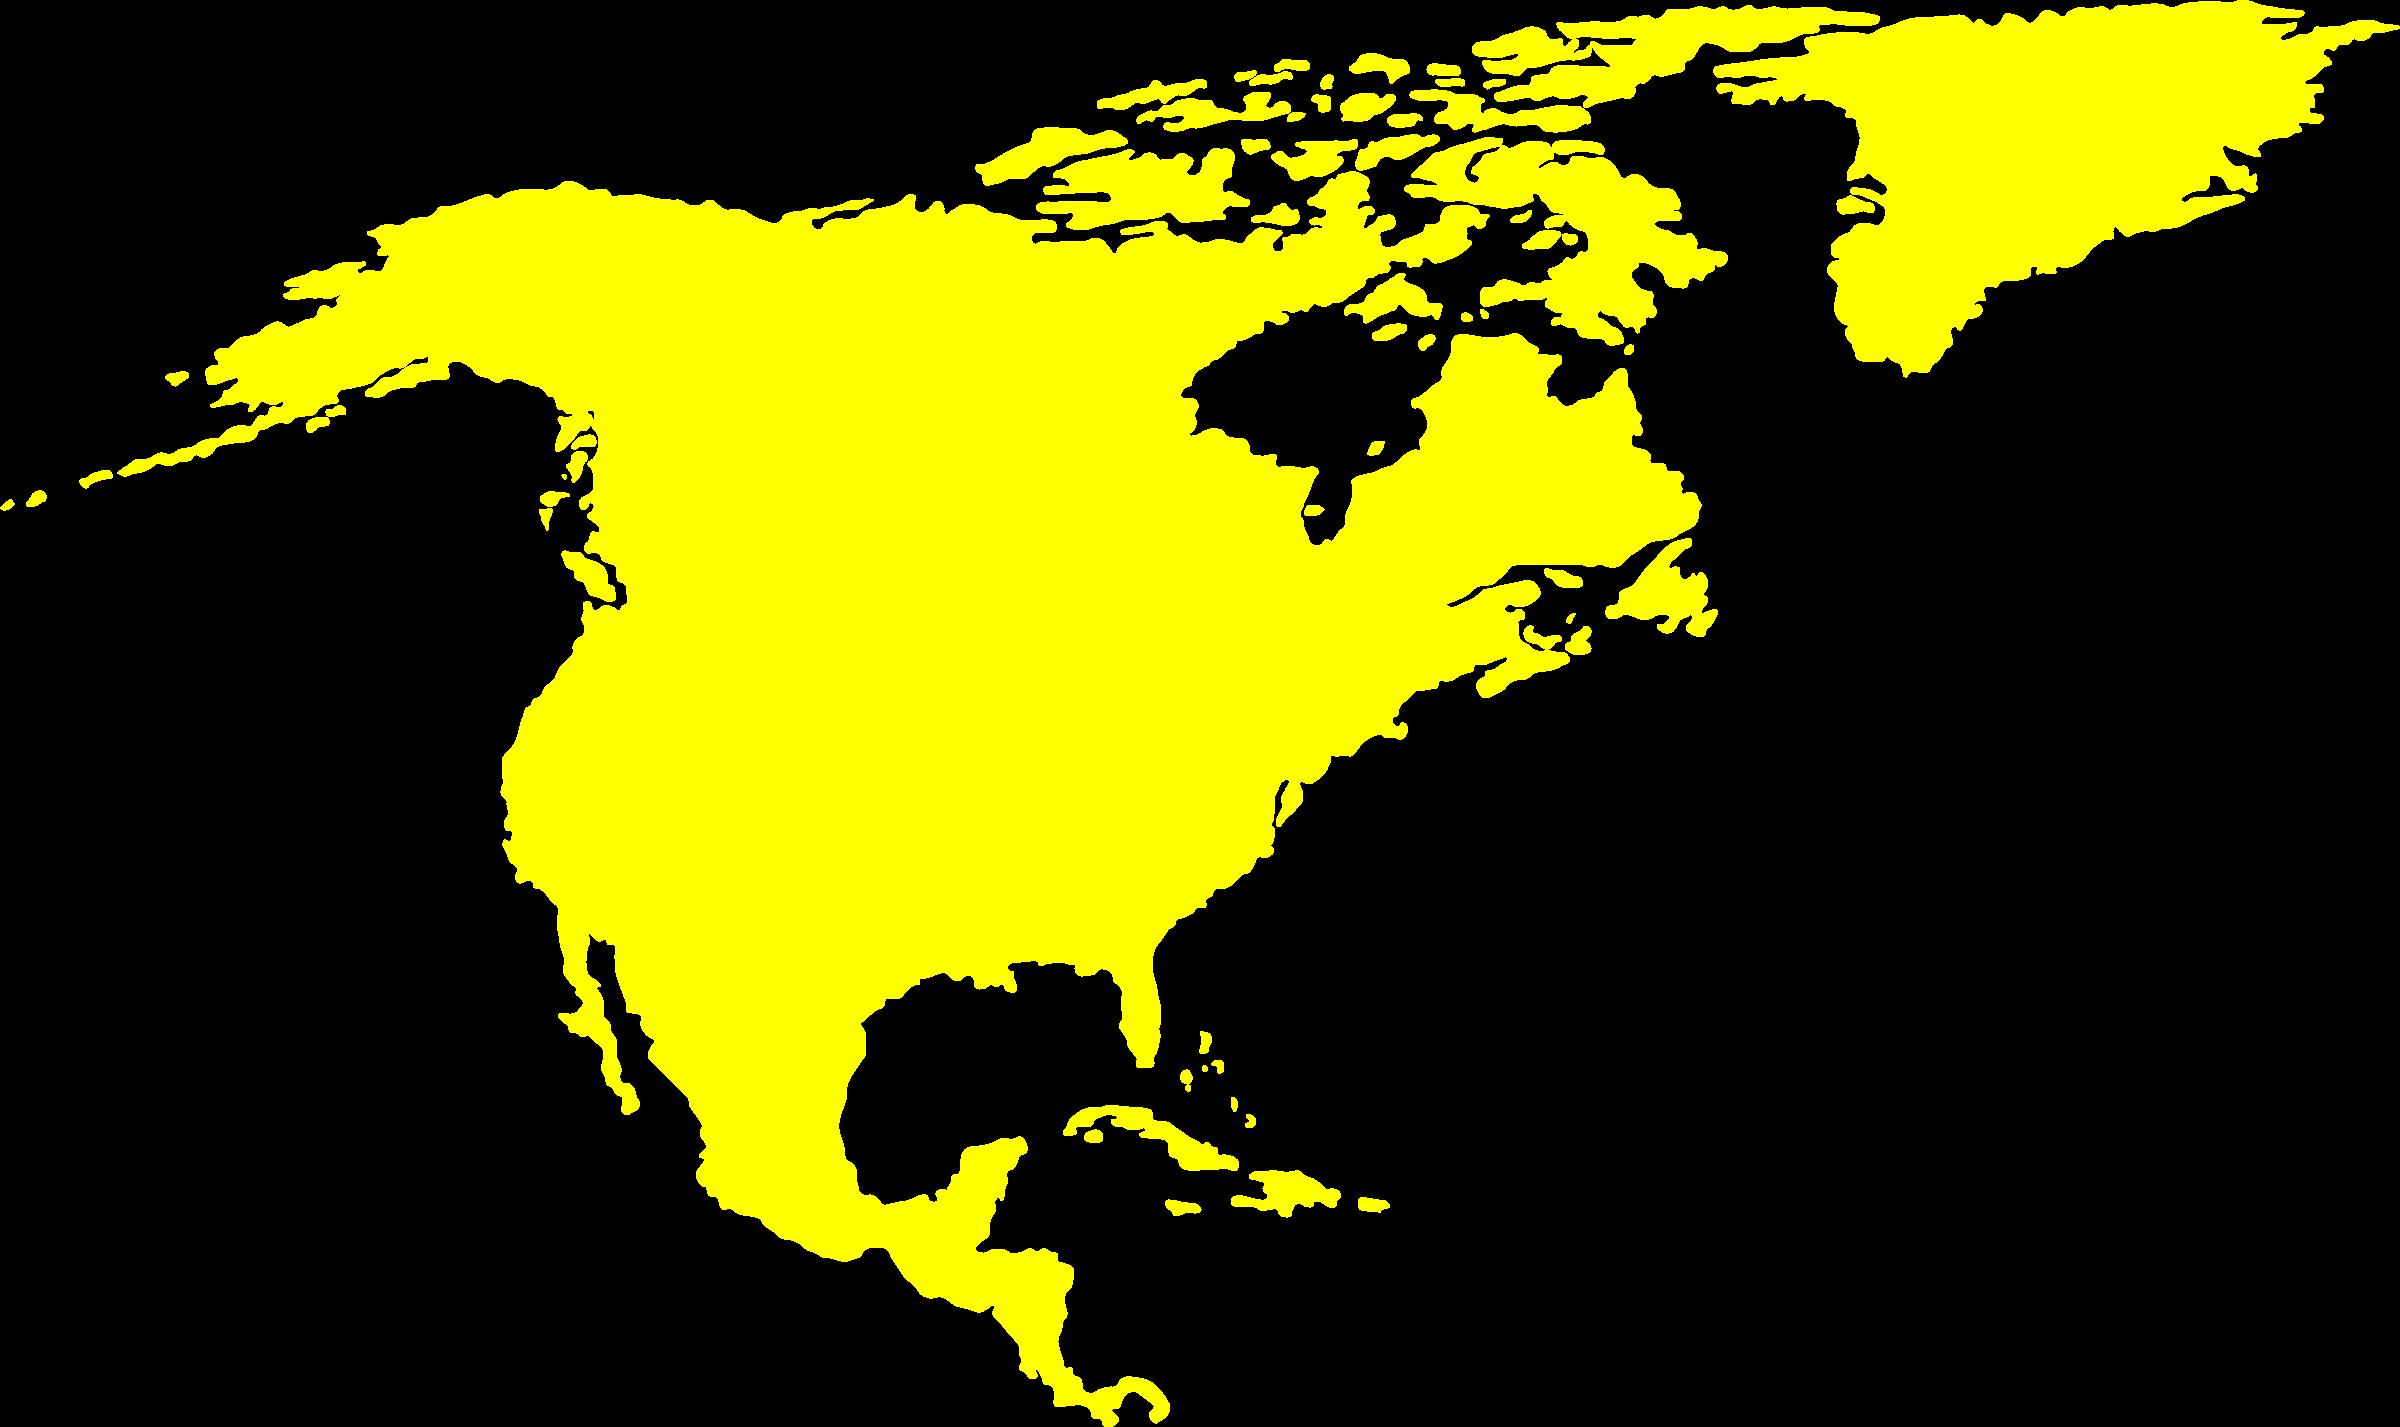 Continent clipart north america Continent American American Clipart North